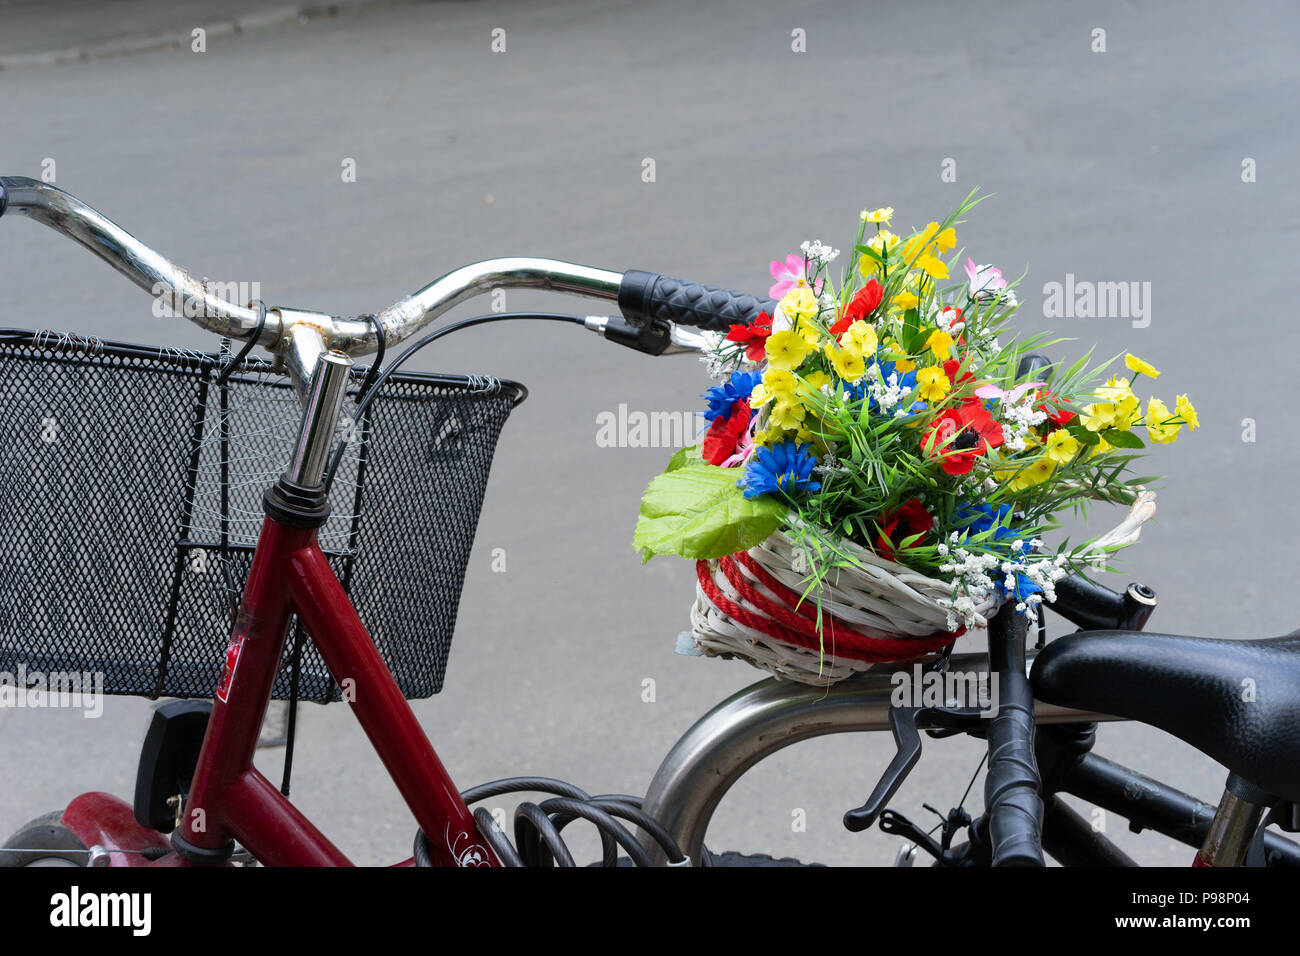 Bicycle with basket of imitation flowers. Poland, Europe. - Stock Image